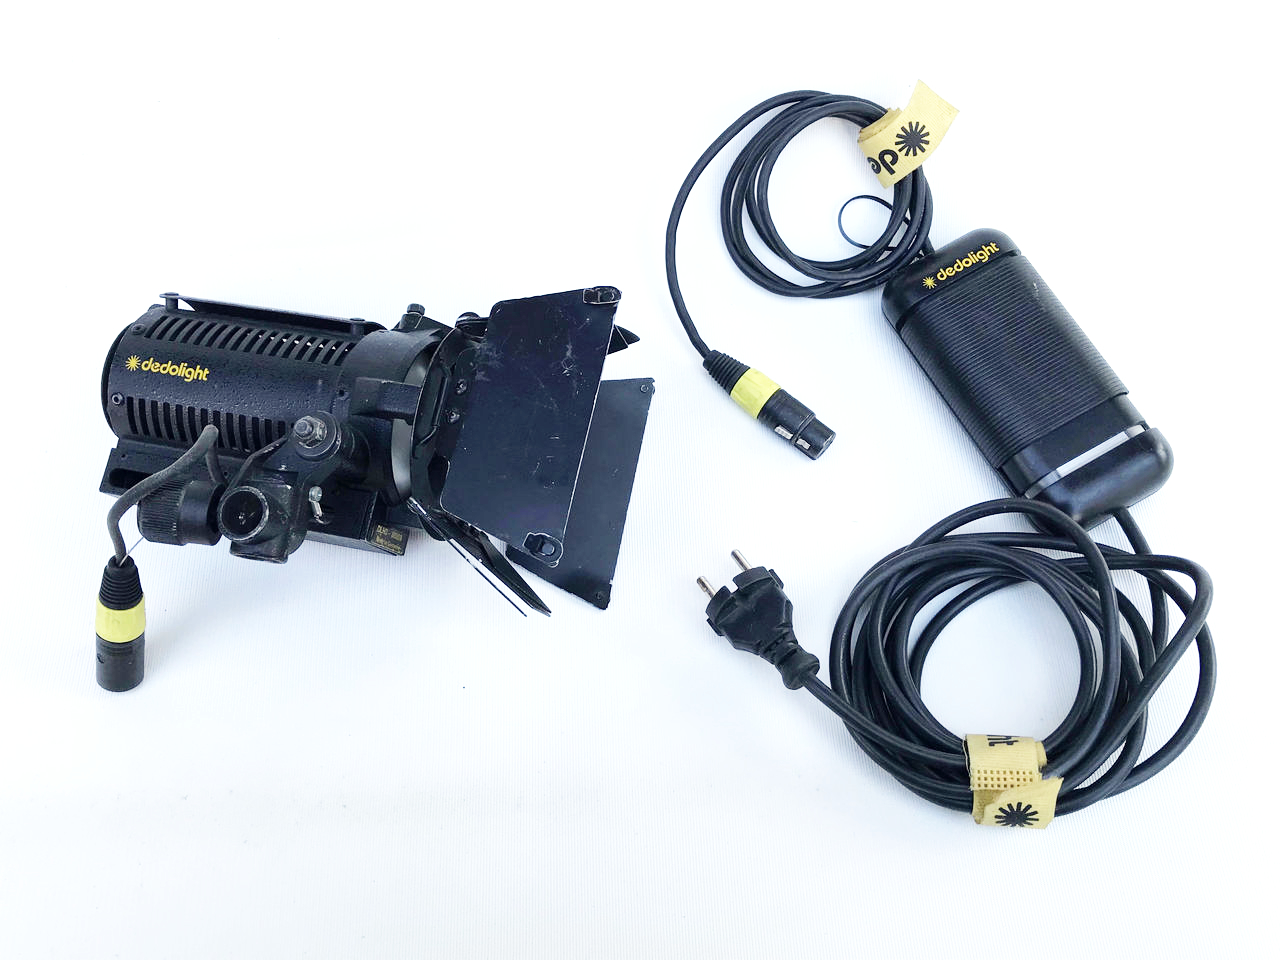 DedoLight DLH4 100W / 12V  Schnurtrafo 1